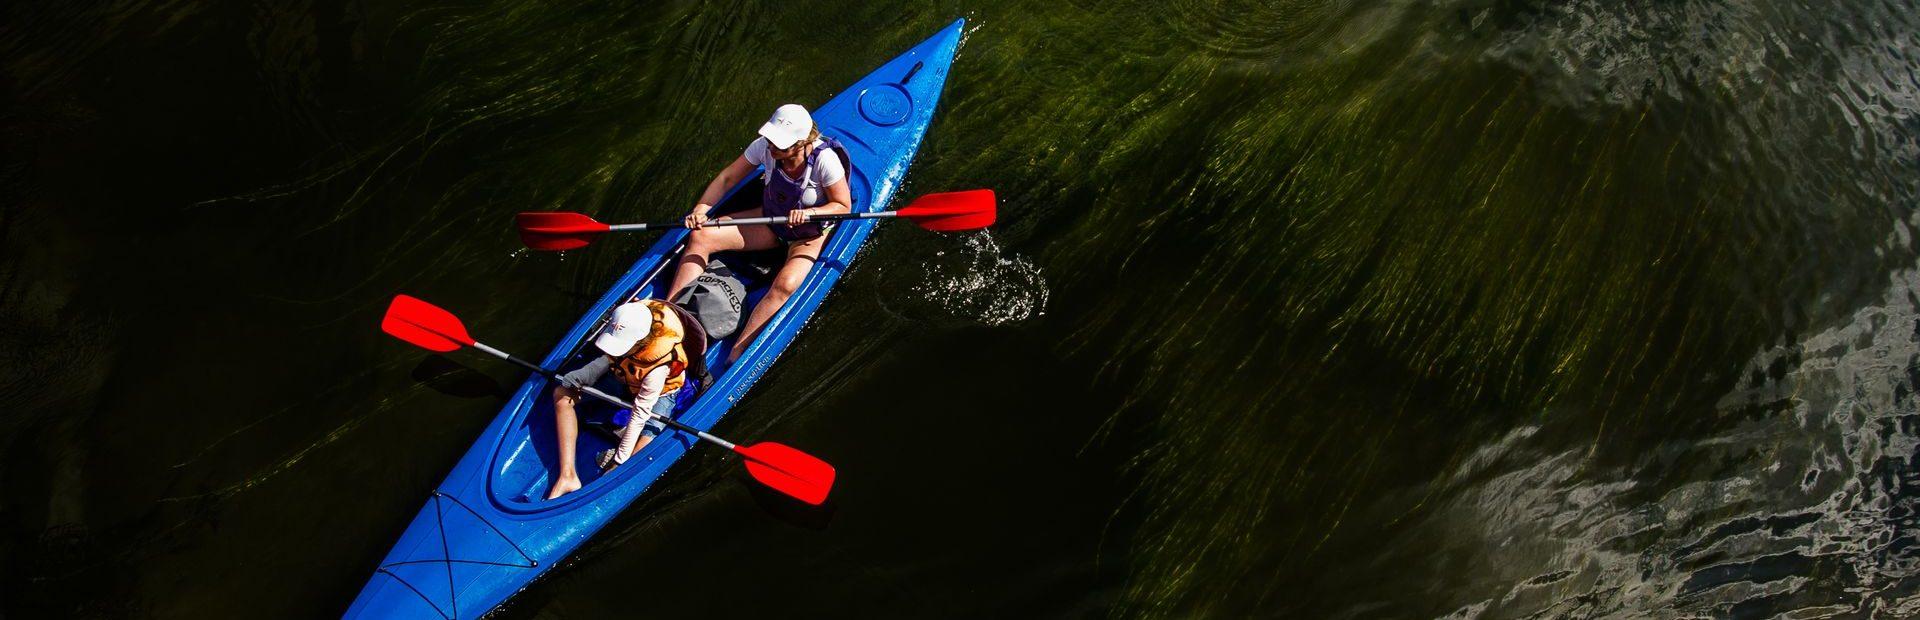 Tucholskie Forests by kayak